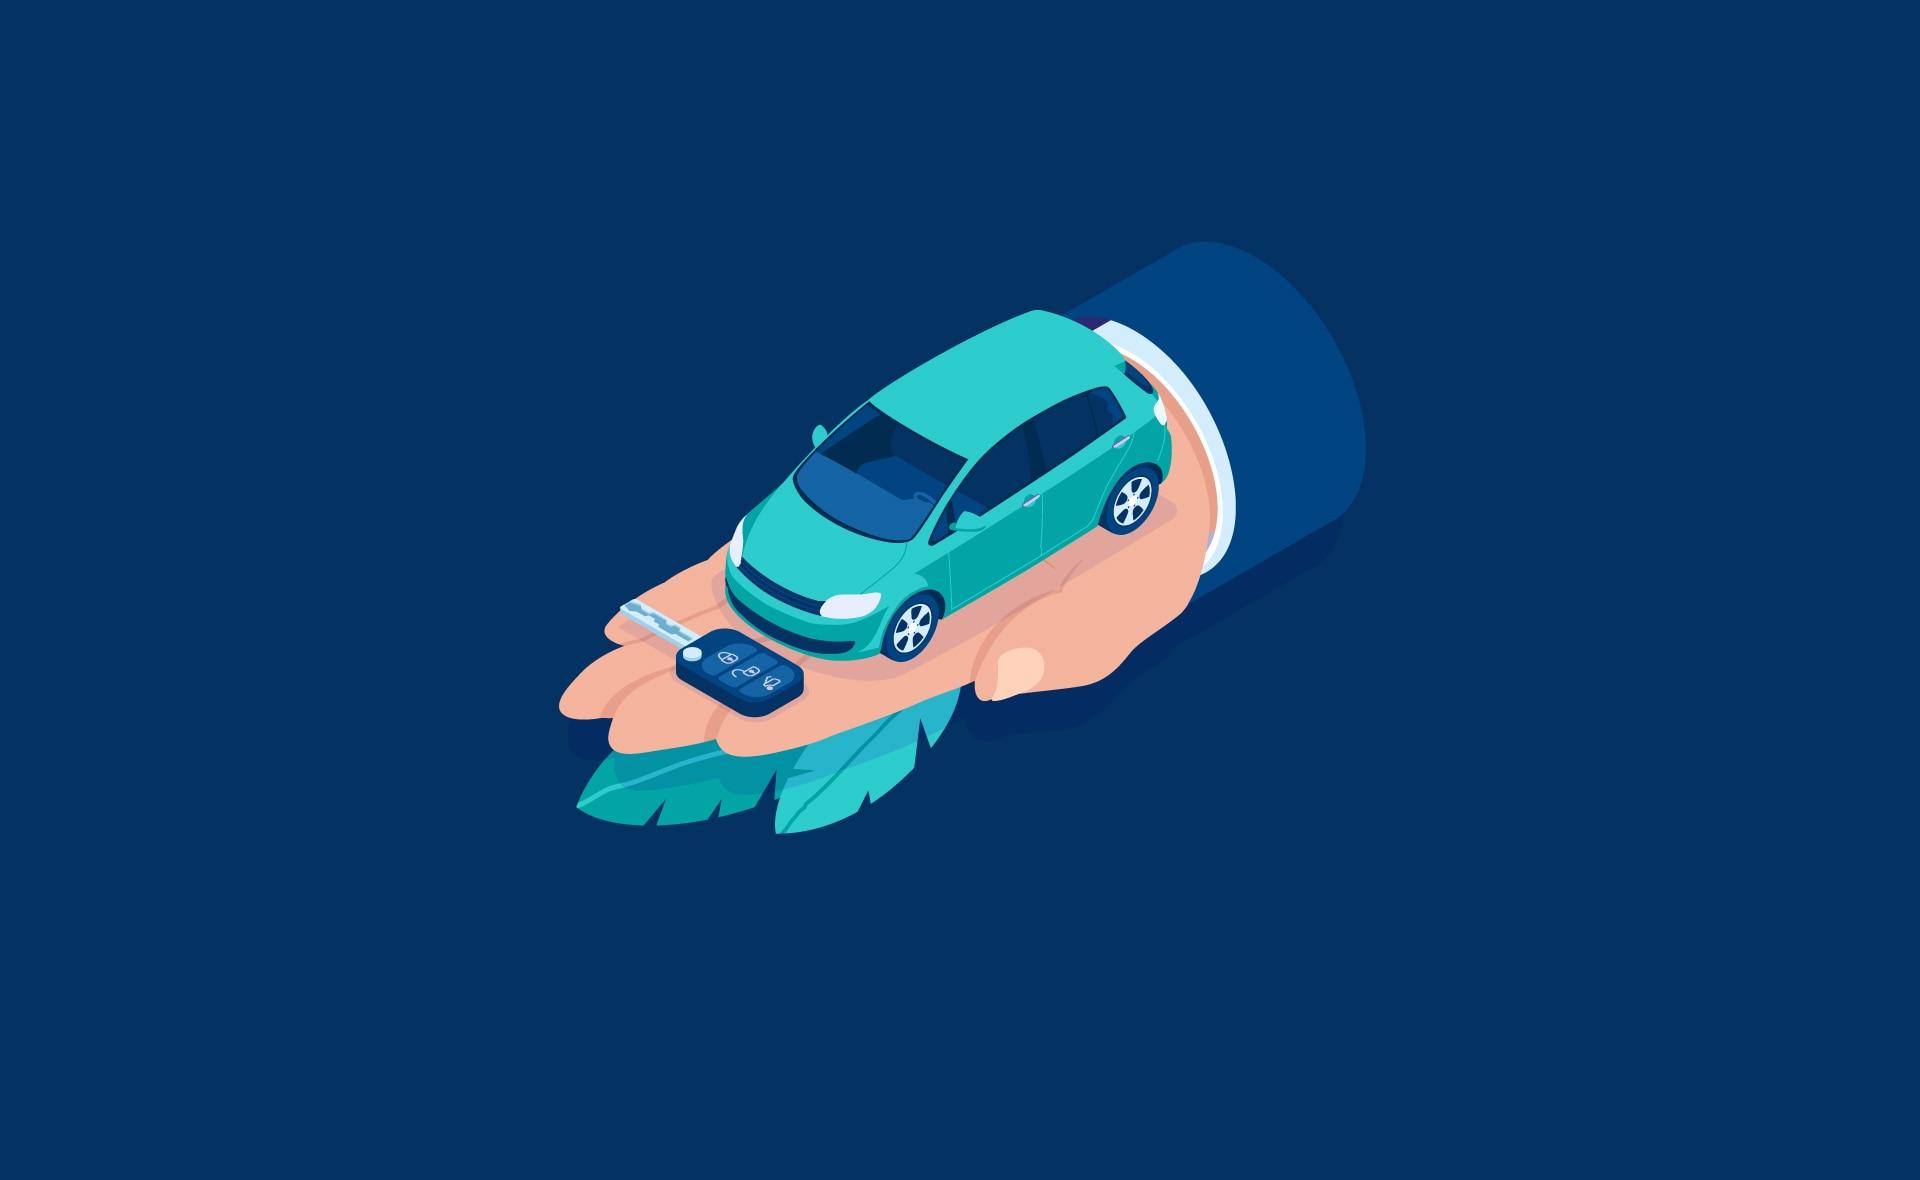 renting_coche-electrico-transporte-automovil-movilidad